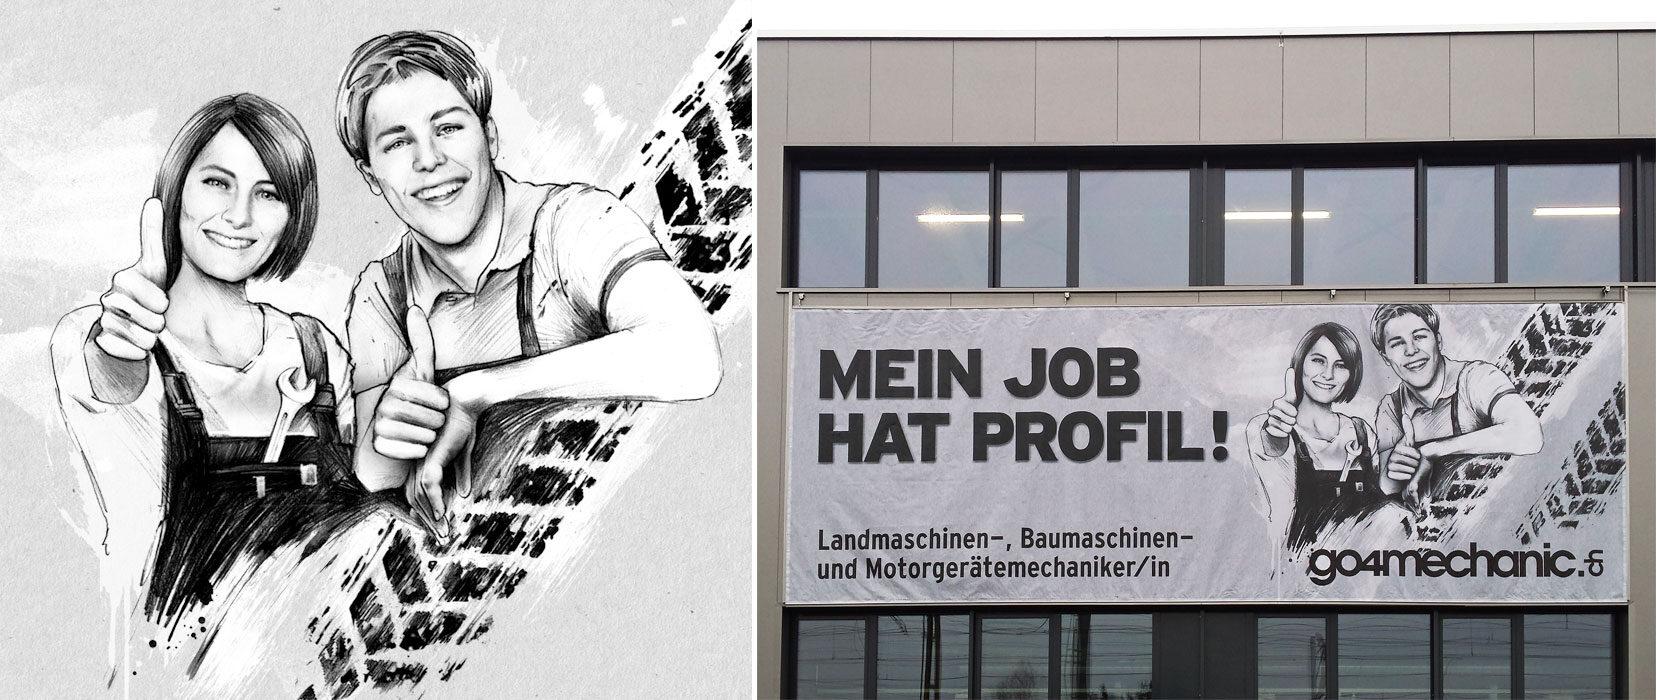 Profil - Kornel Illustration | Kornel Stadler portfolio